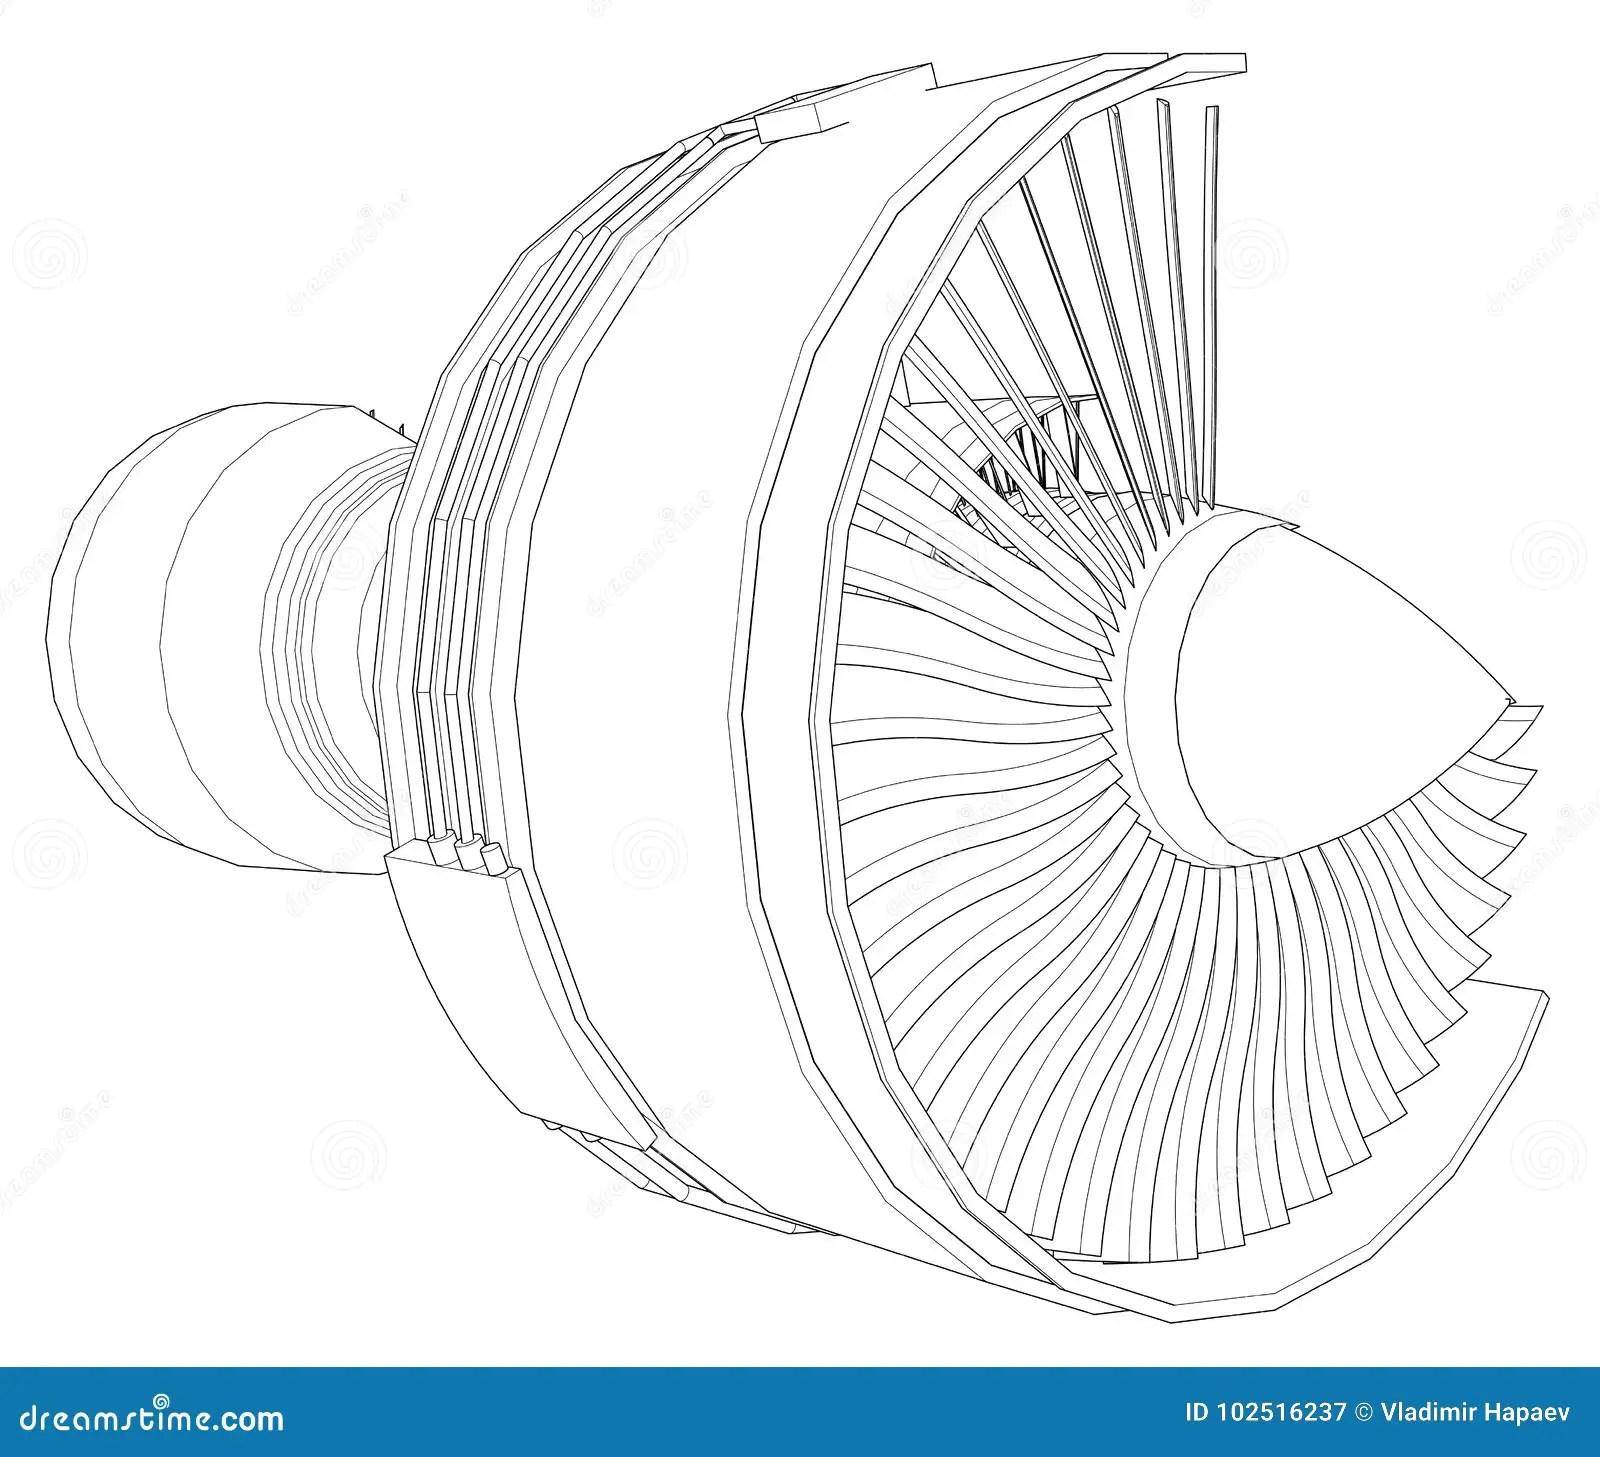 Turbo Jet Engine Aircraft Vector Line Illustration Stock